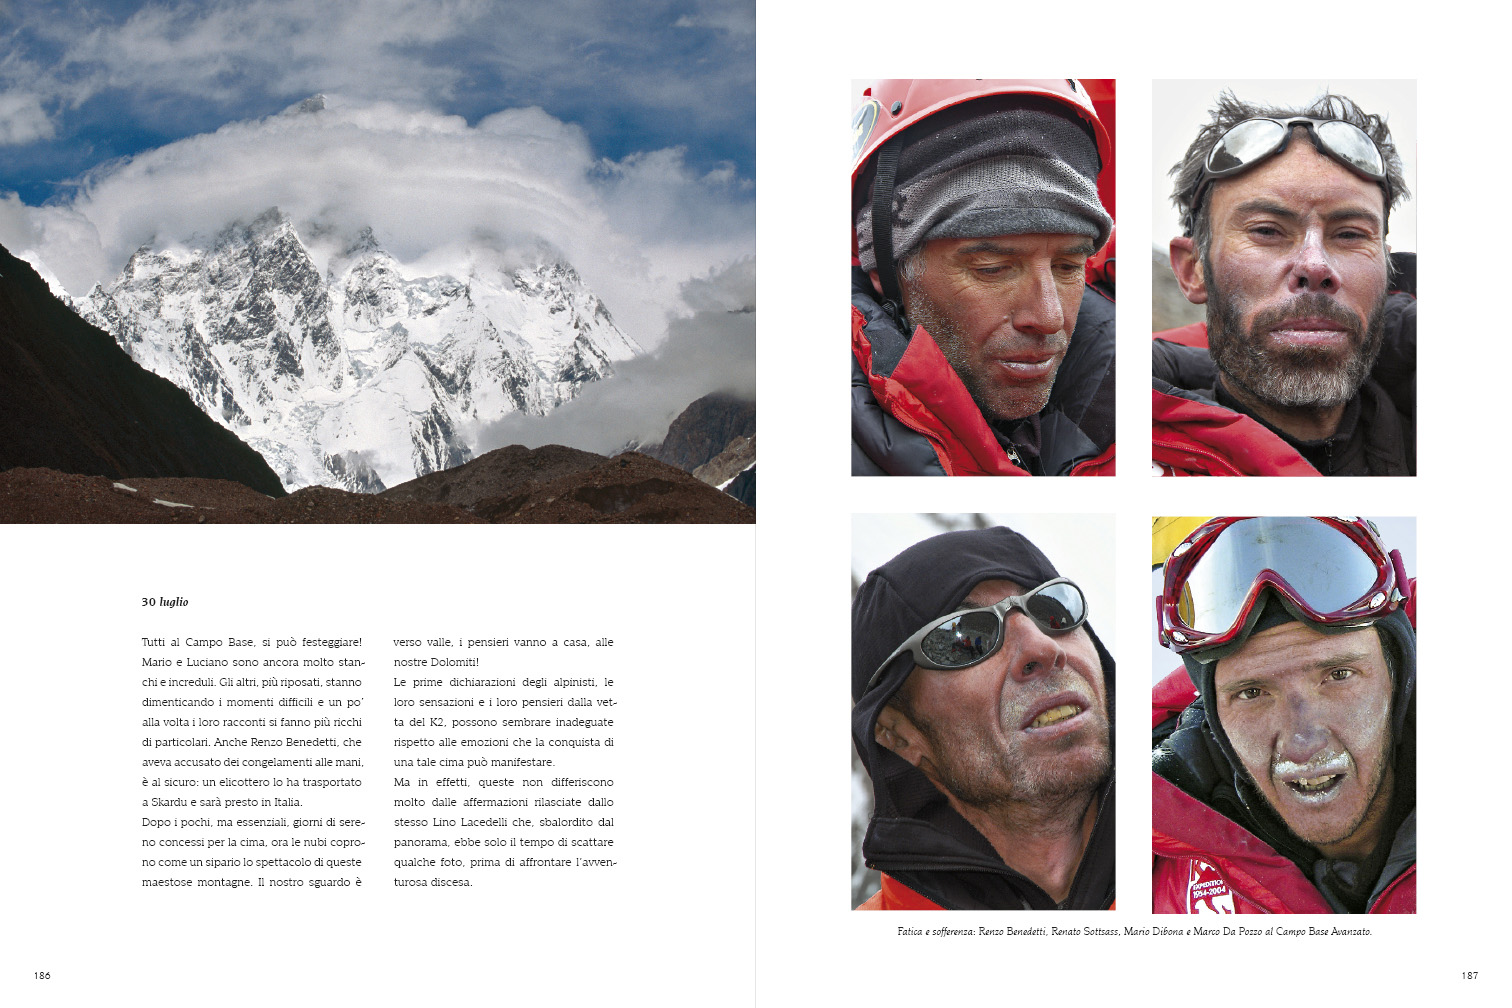 K2 EXPEDITION 1954-2004 Giuseppe Ghedina Fotografo - 095.jpg